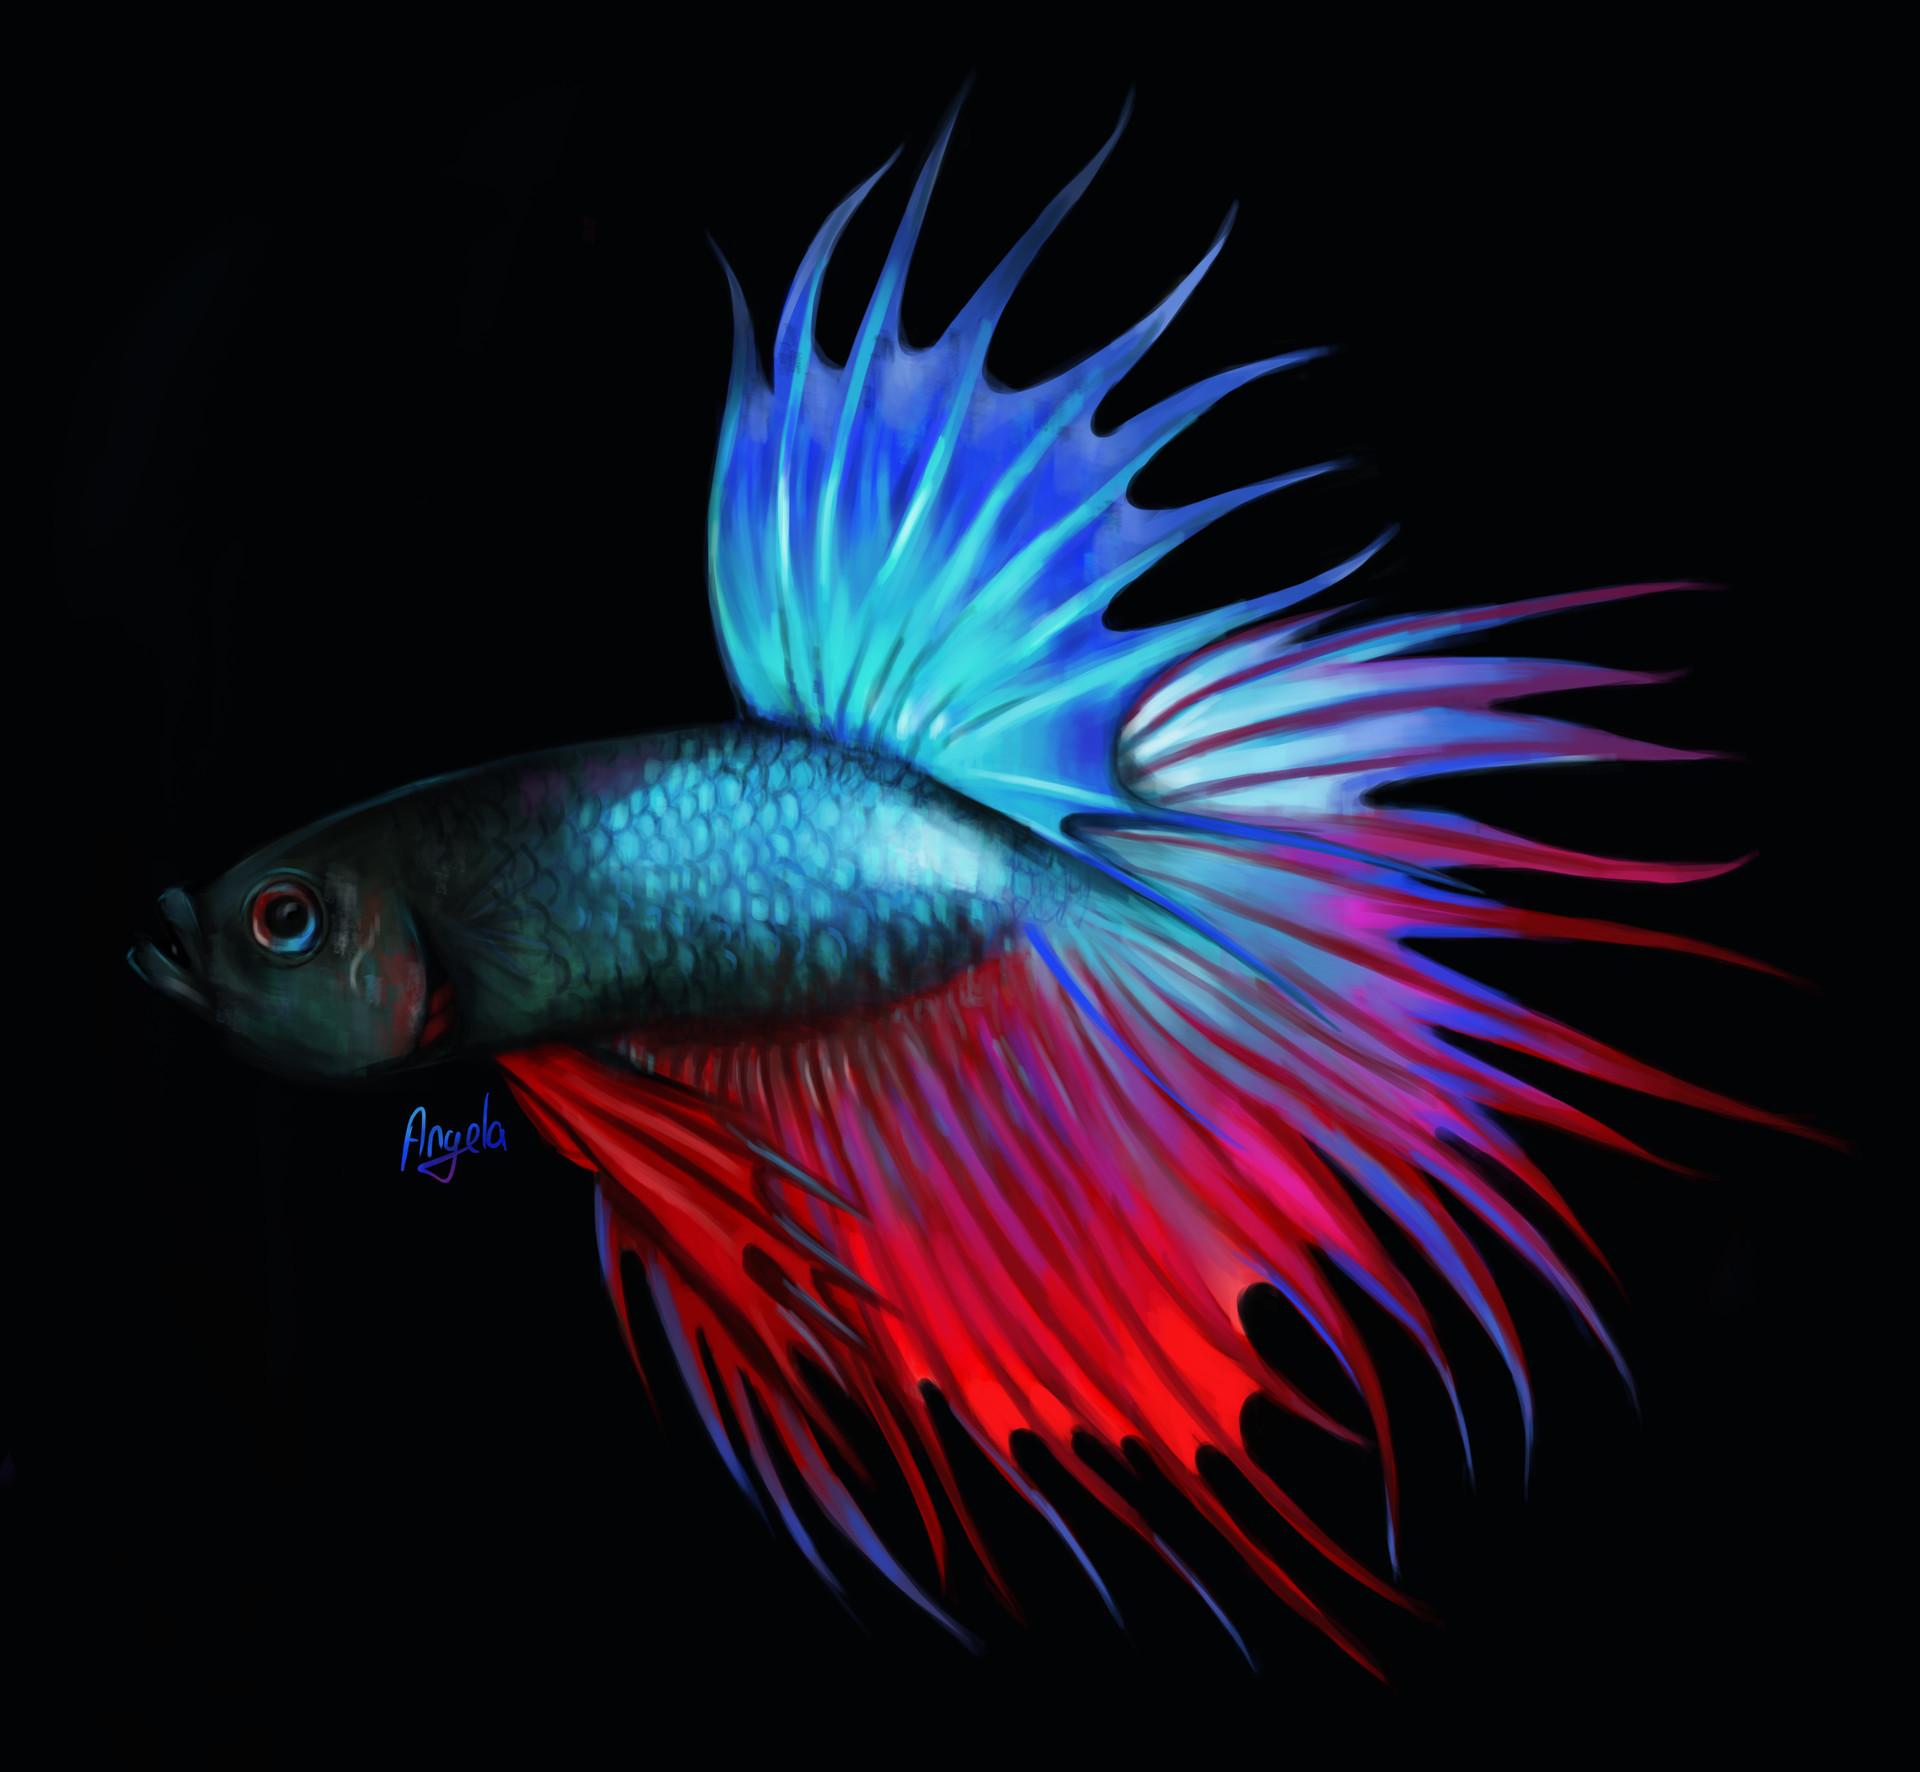 ArtStation - Japanese Fighting Fish, Angela Kravcevich